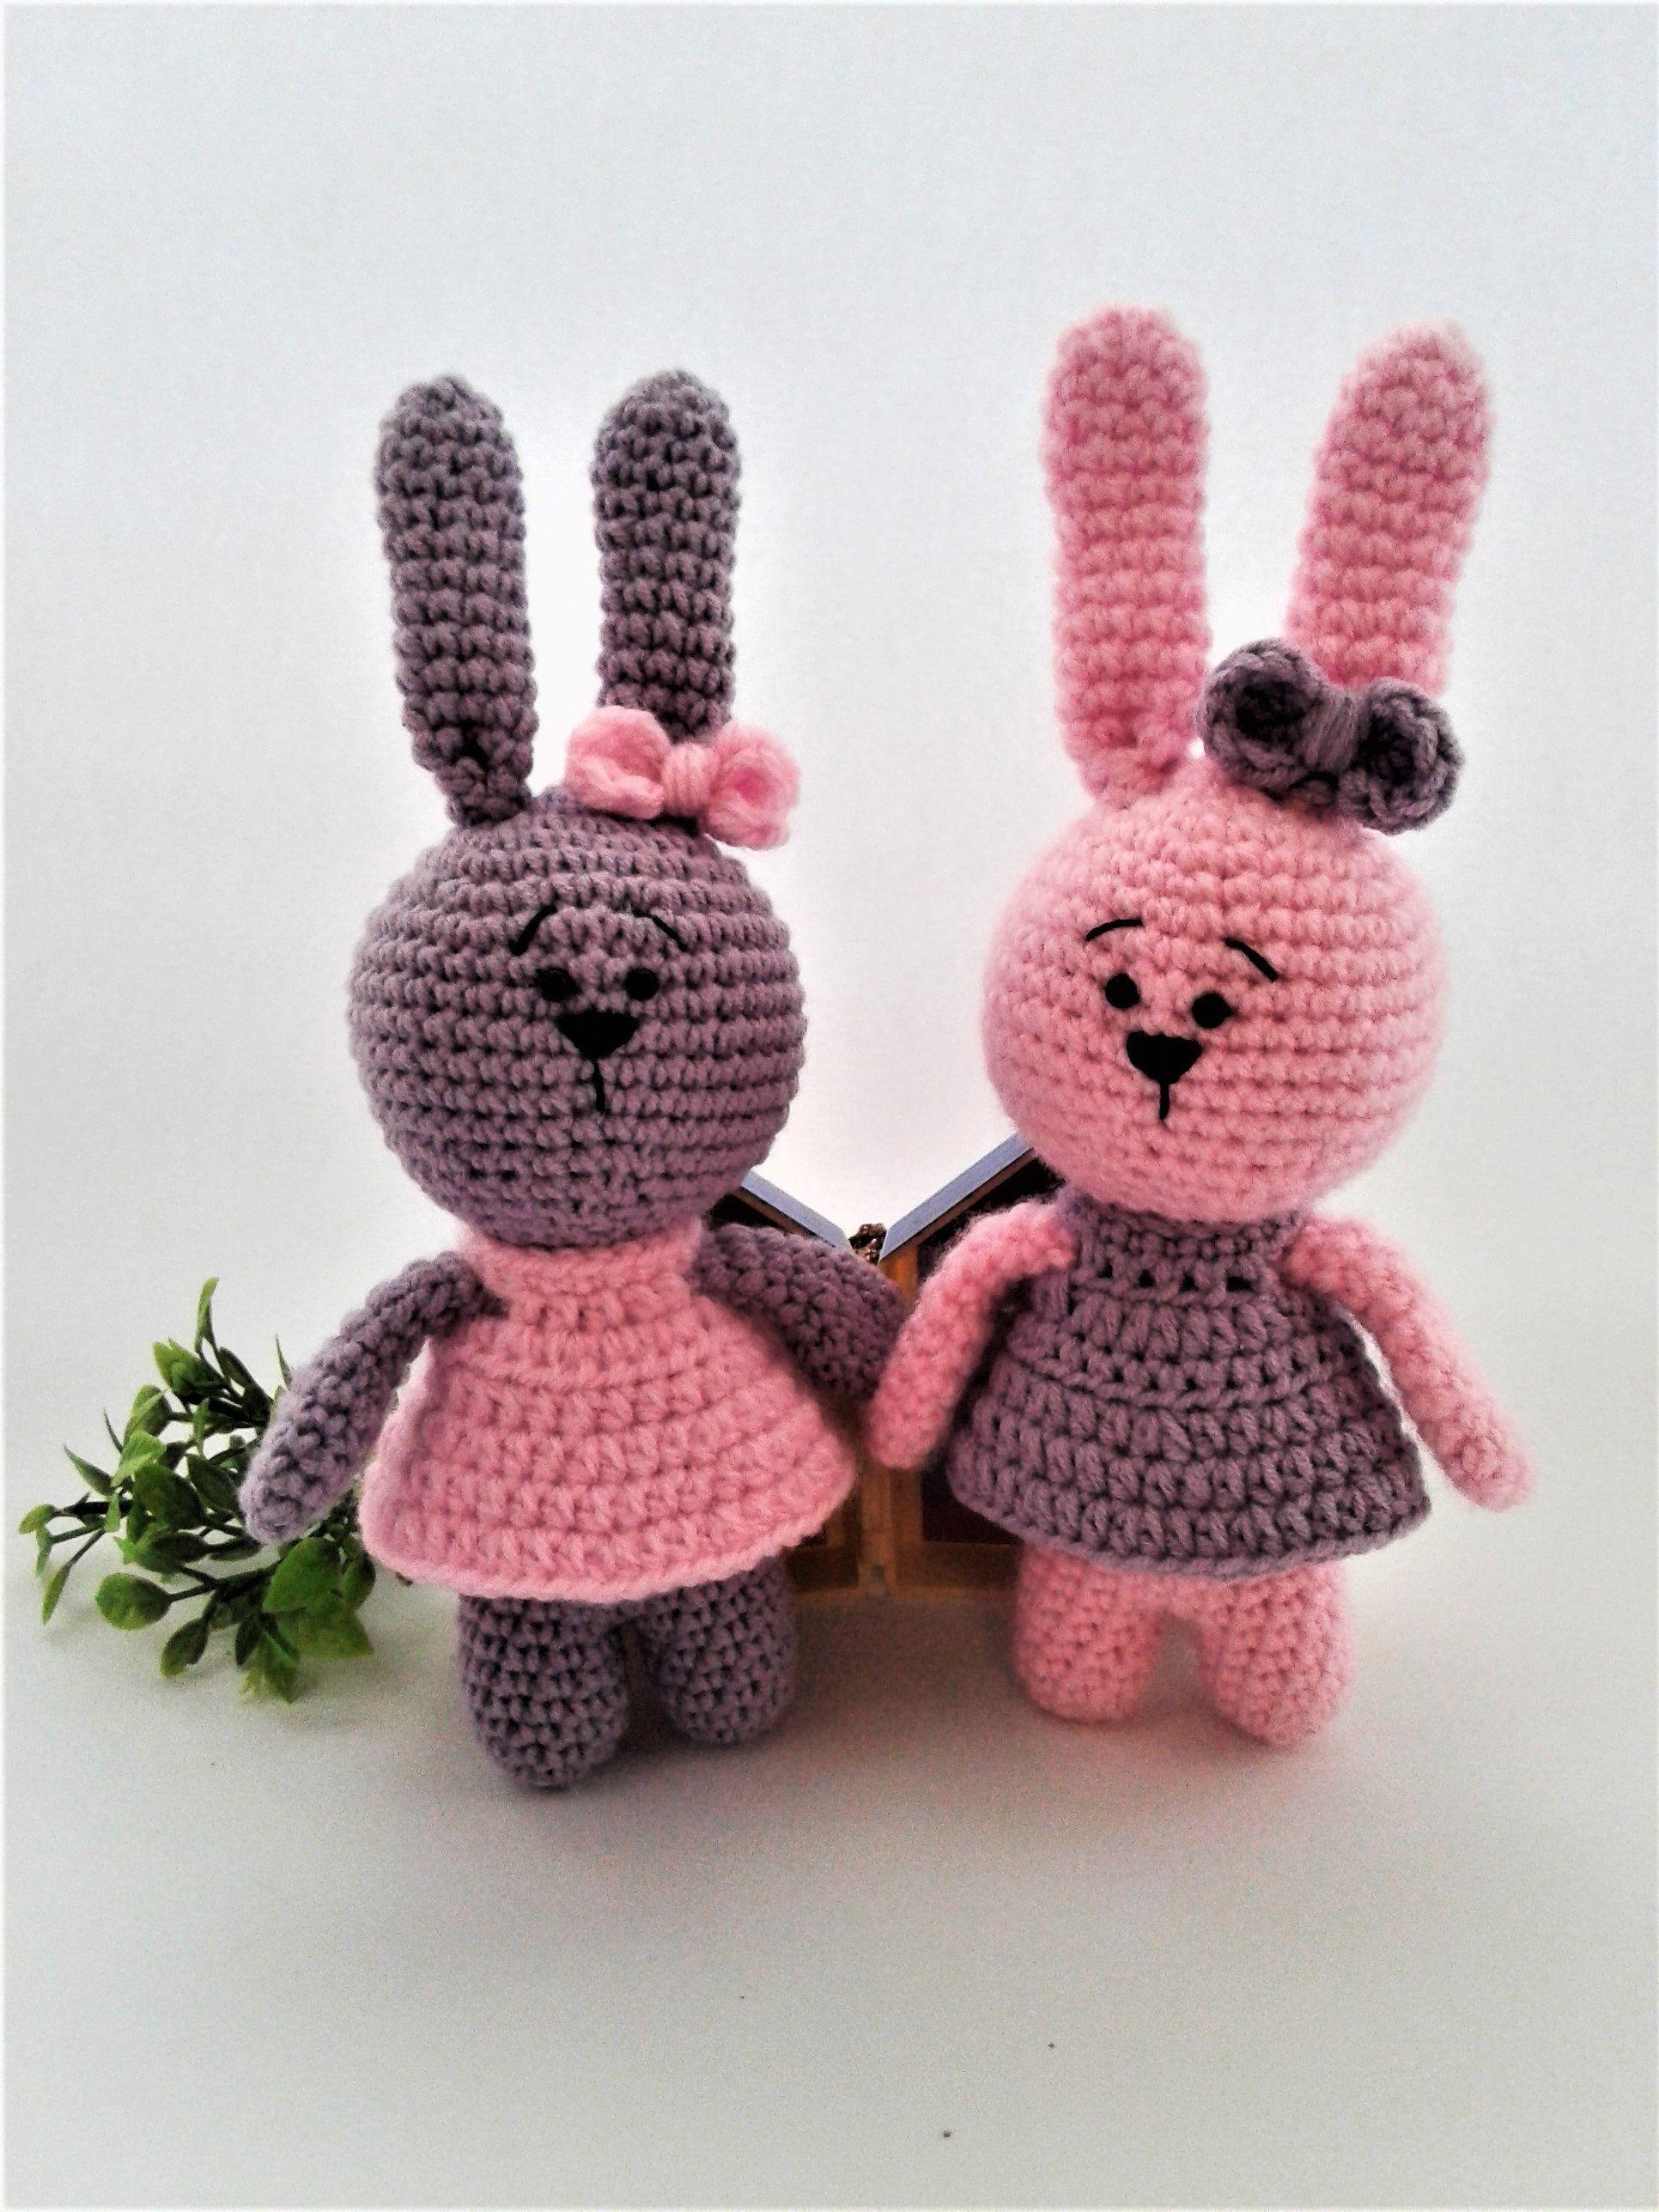 Free Amigurumi Bunny Crochet Patterns   Easter crochet patterns ...   2576x1932